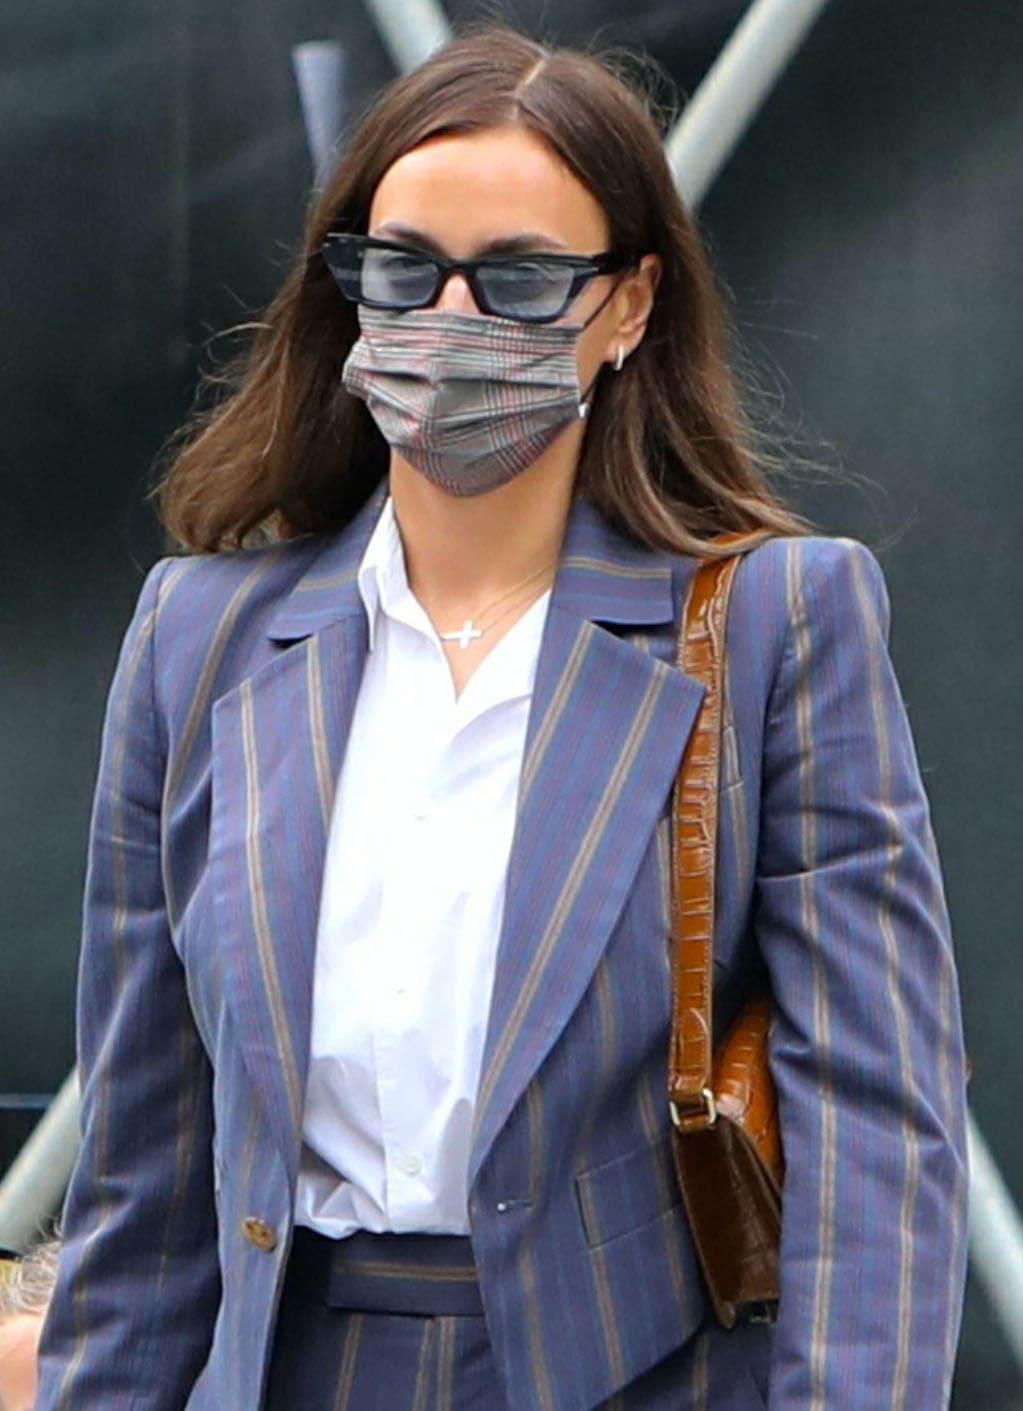 Irina Shayk hides her face in Fenty Inside Story sunnies and Maskc tartan face mask